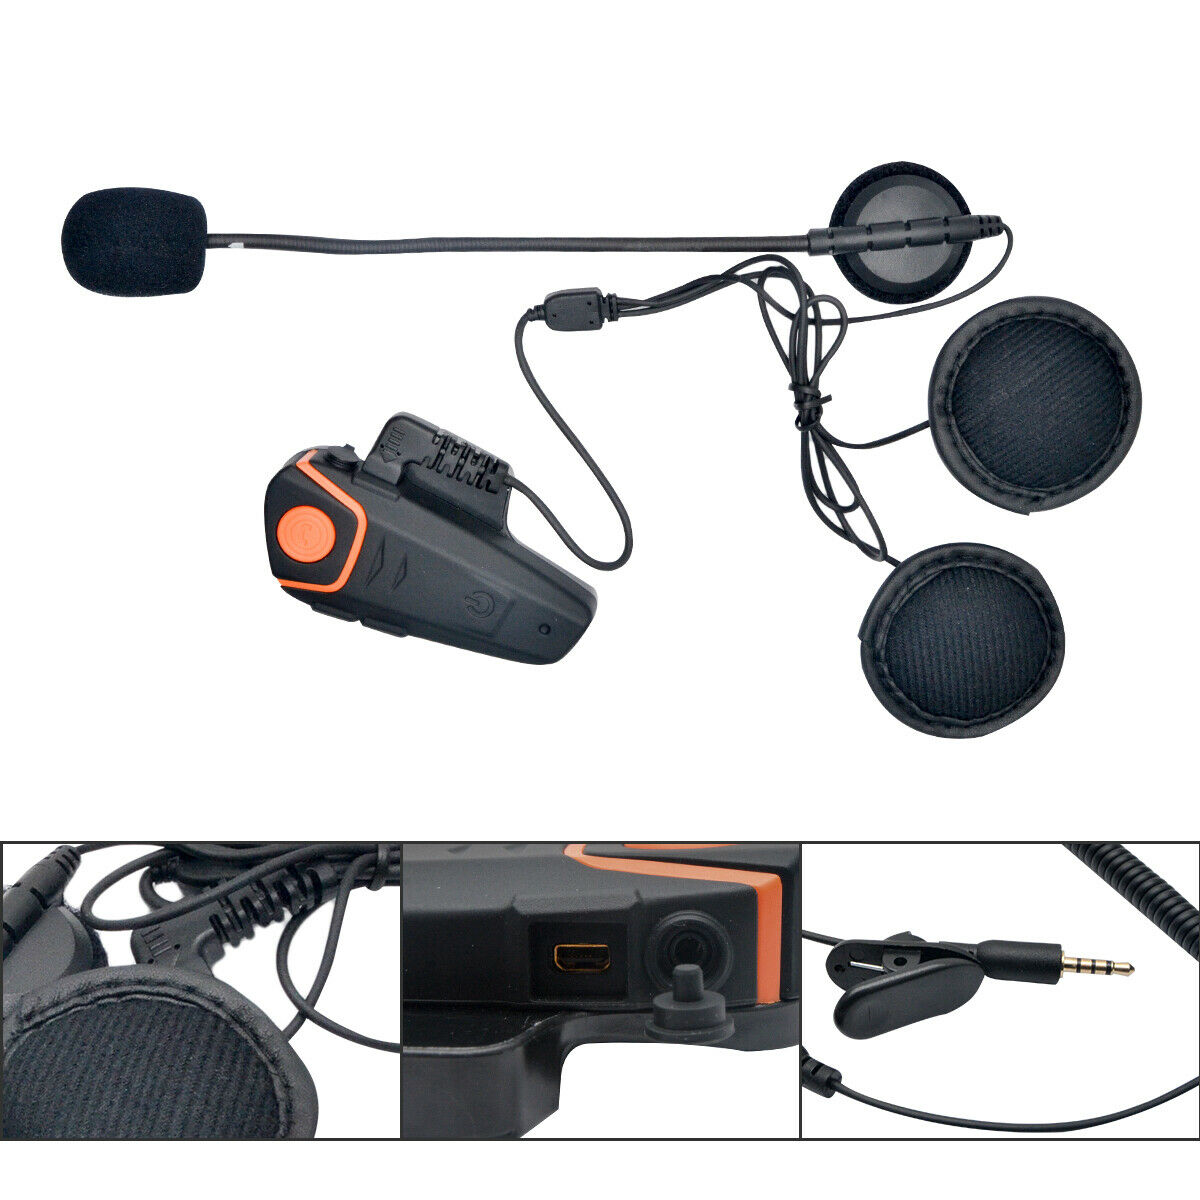 1000 m BT-S2 casque de moto Bluetooth casque moto interphone étanche